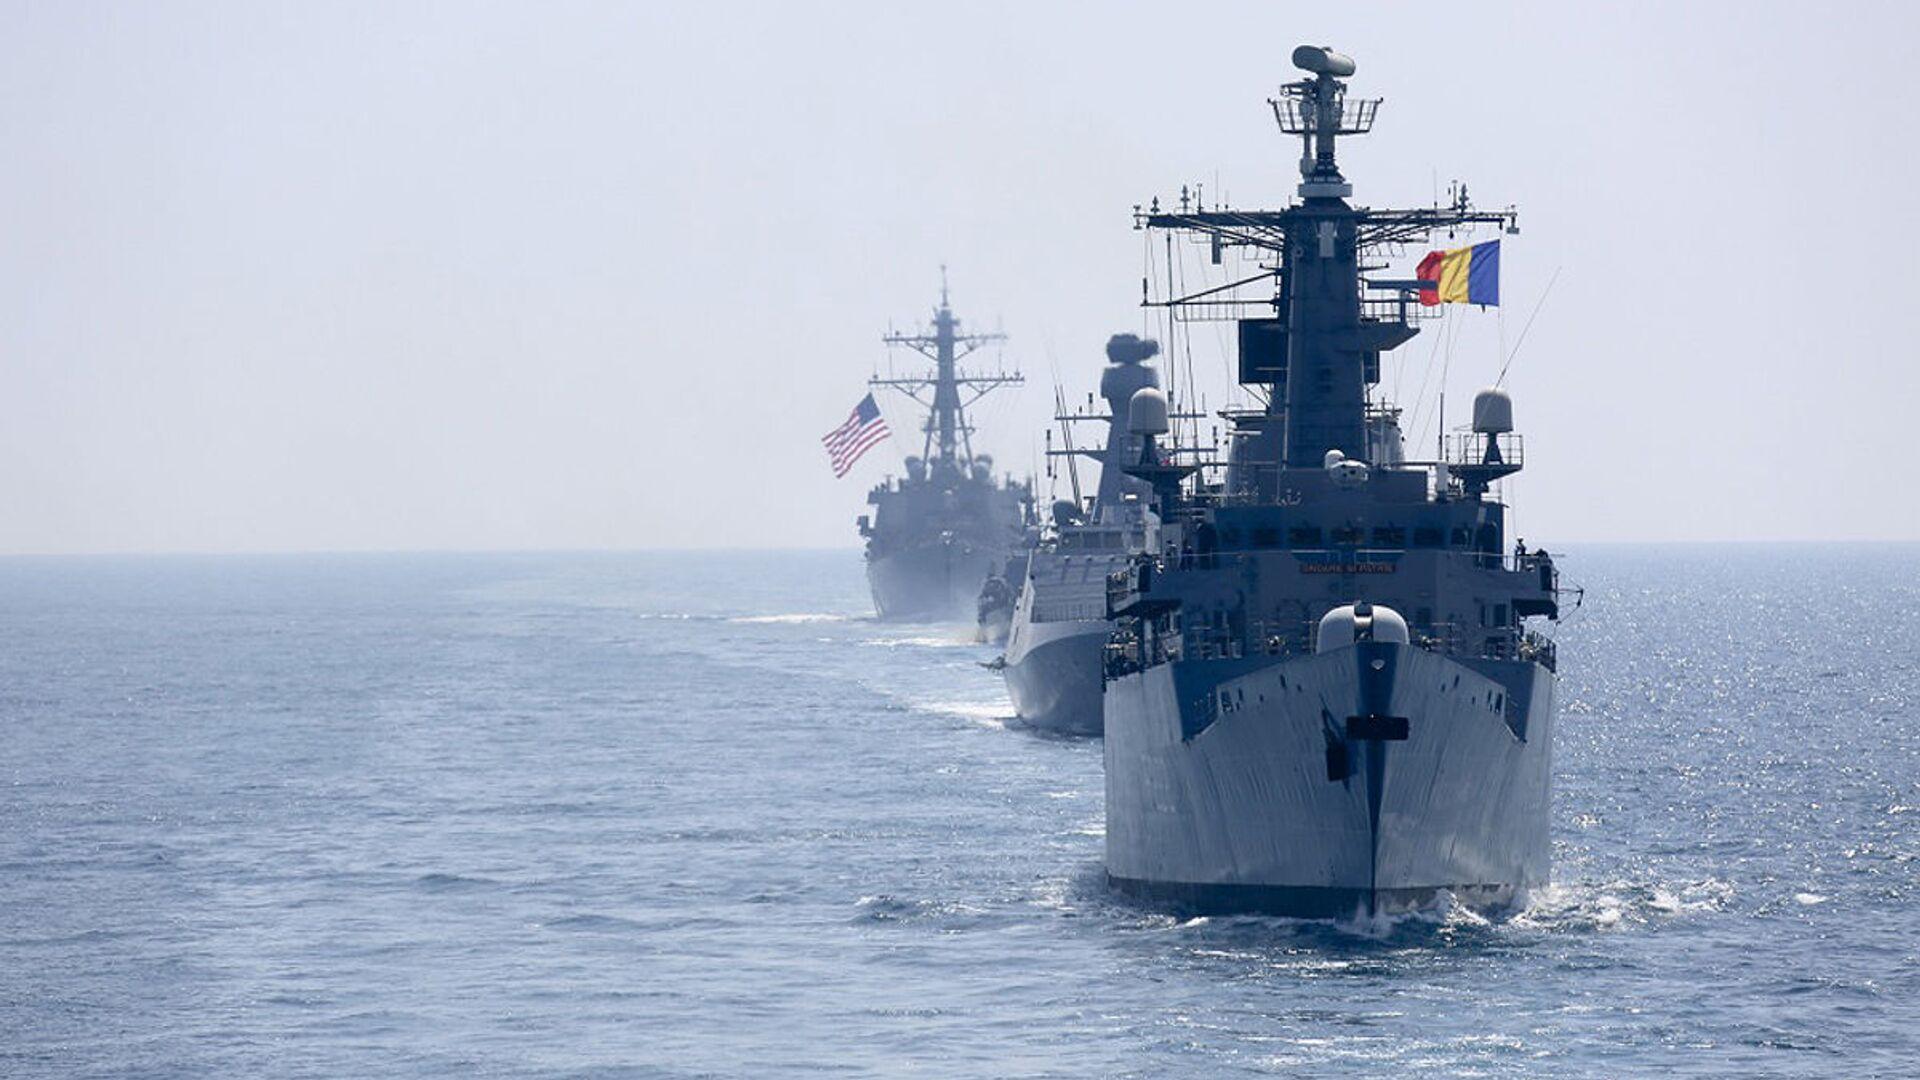 Корабли НАТО в Черном море - РИА Новости, 1920, 01.08.2021